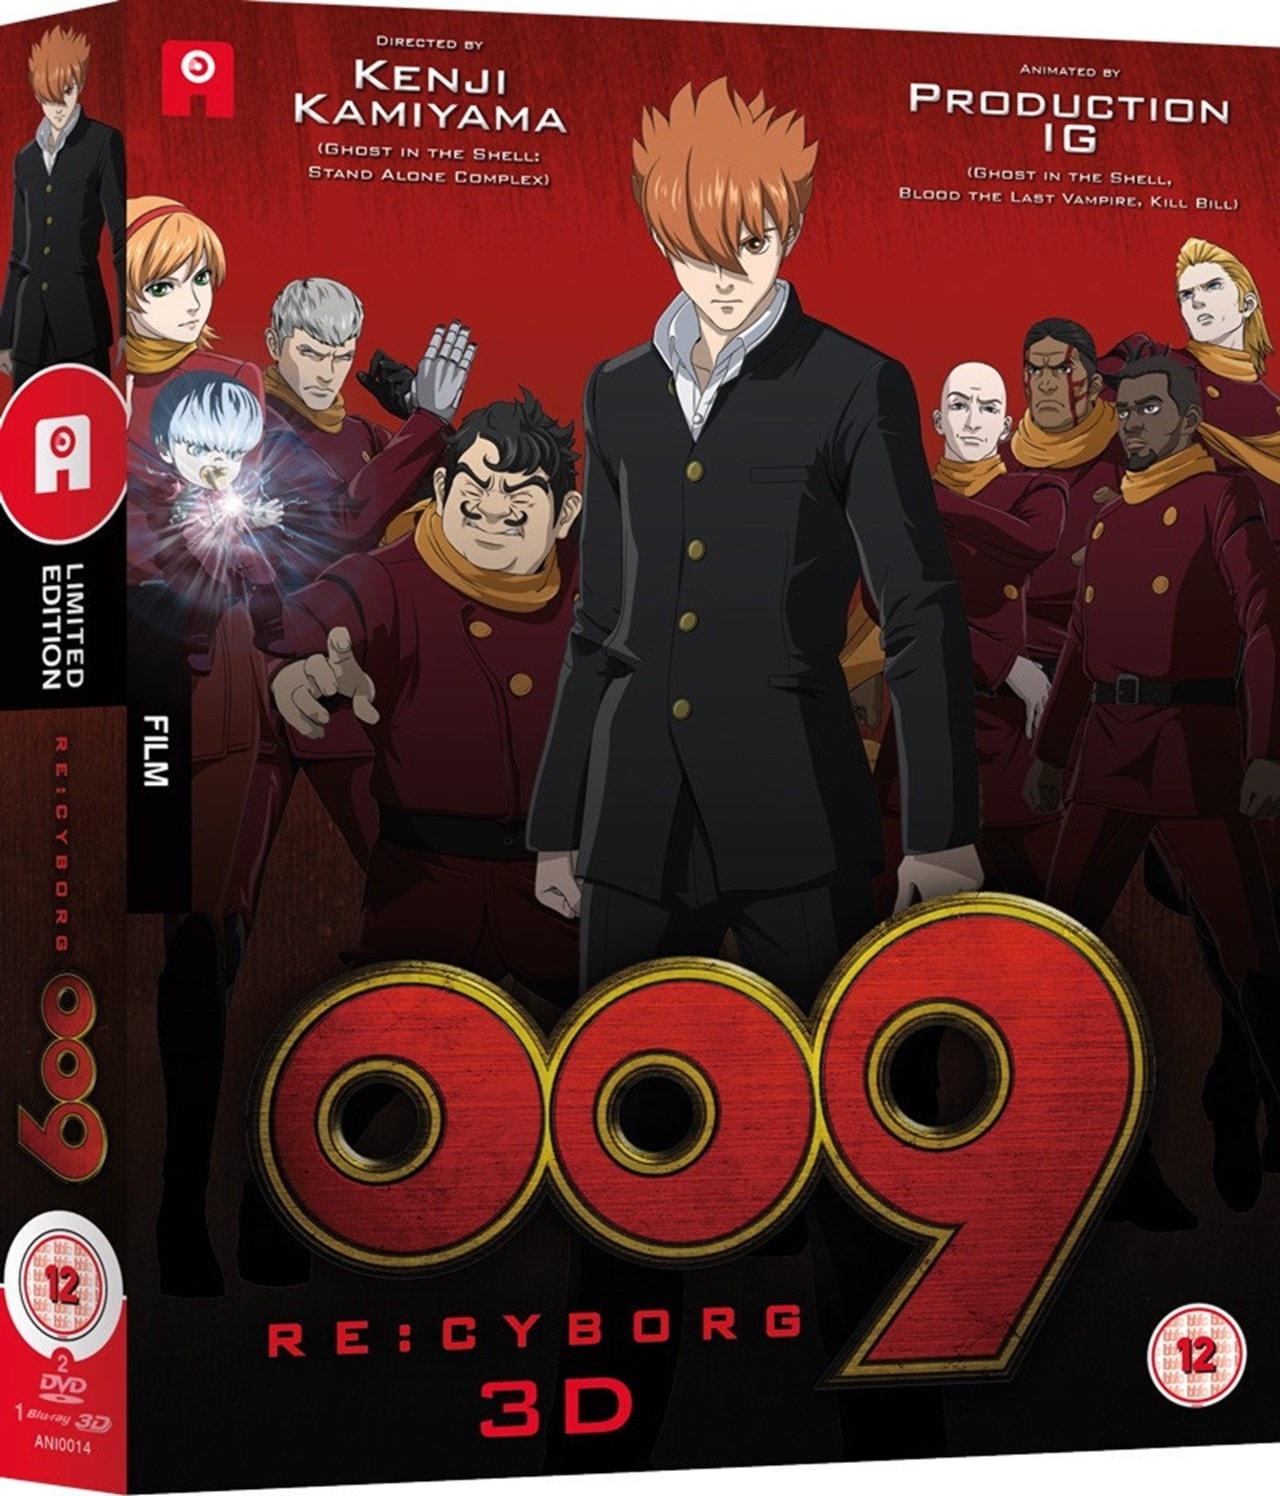 009 Re:Cyborg - 2